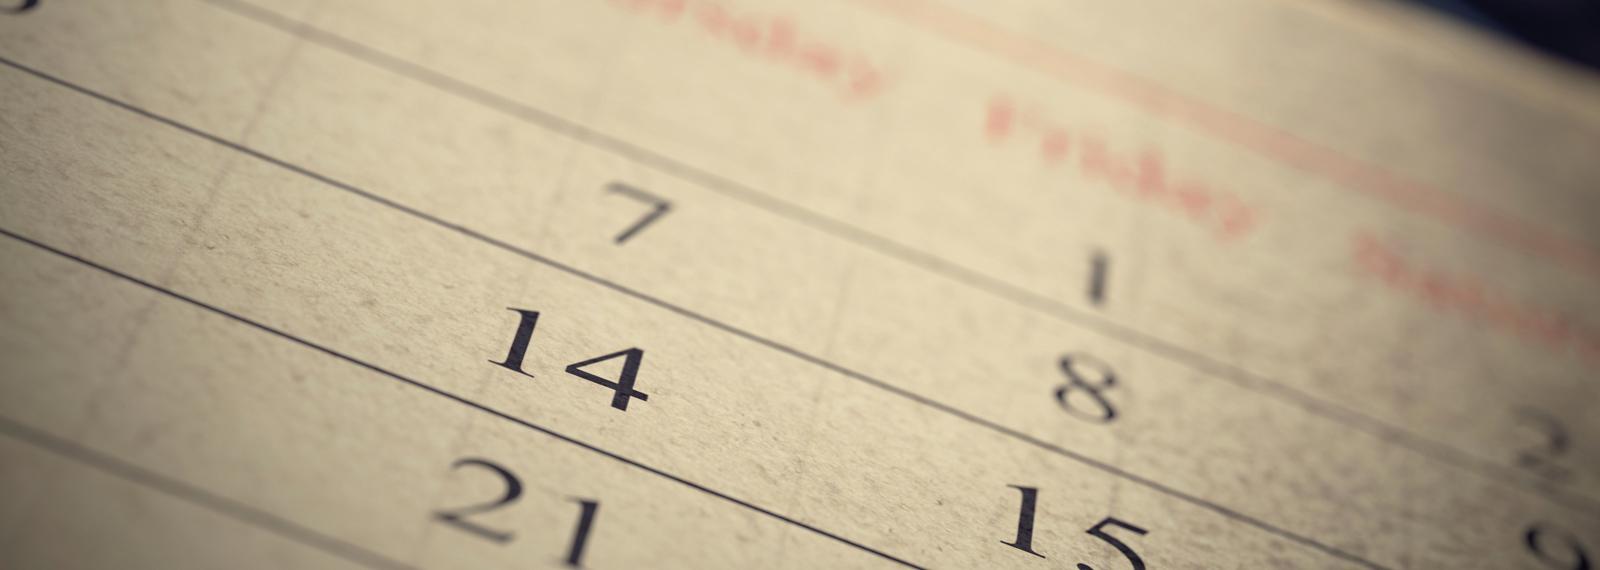 Liturgical Calendar within Catholic Liturgical Calendar Year C 2019-2020